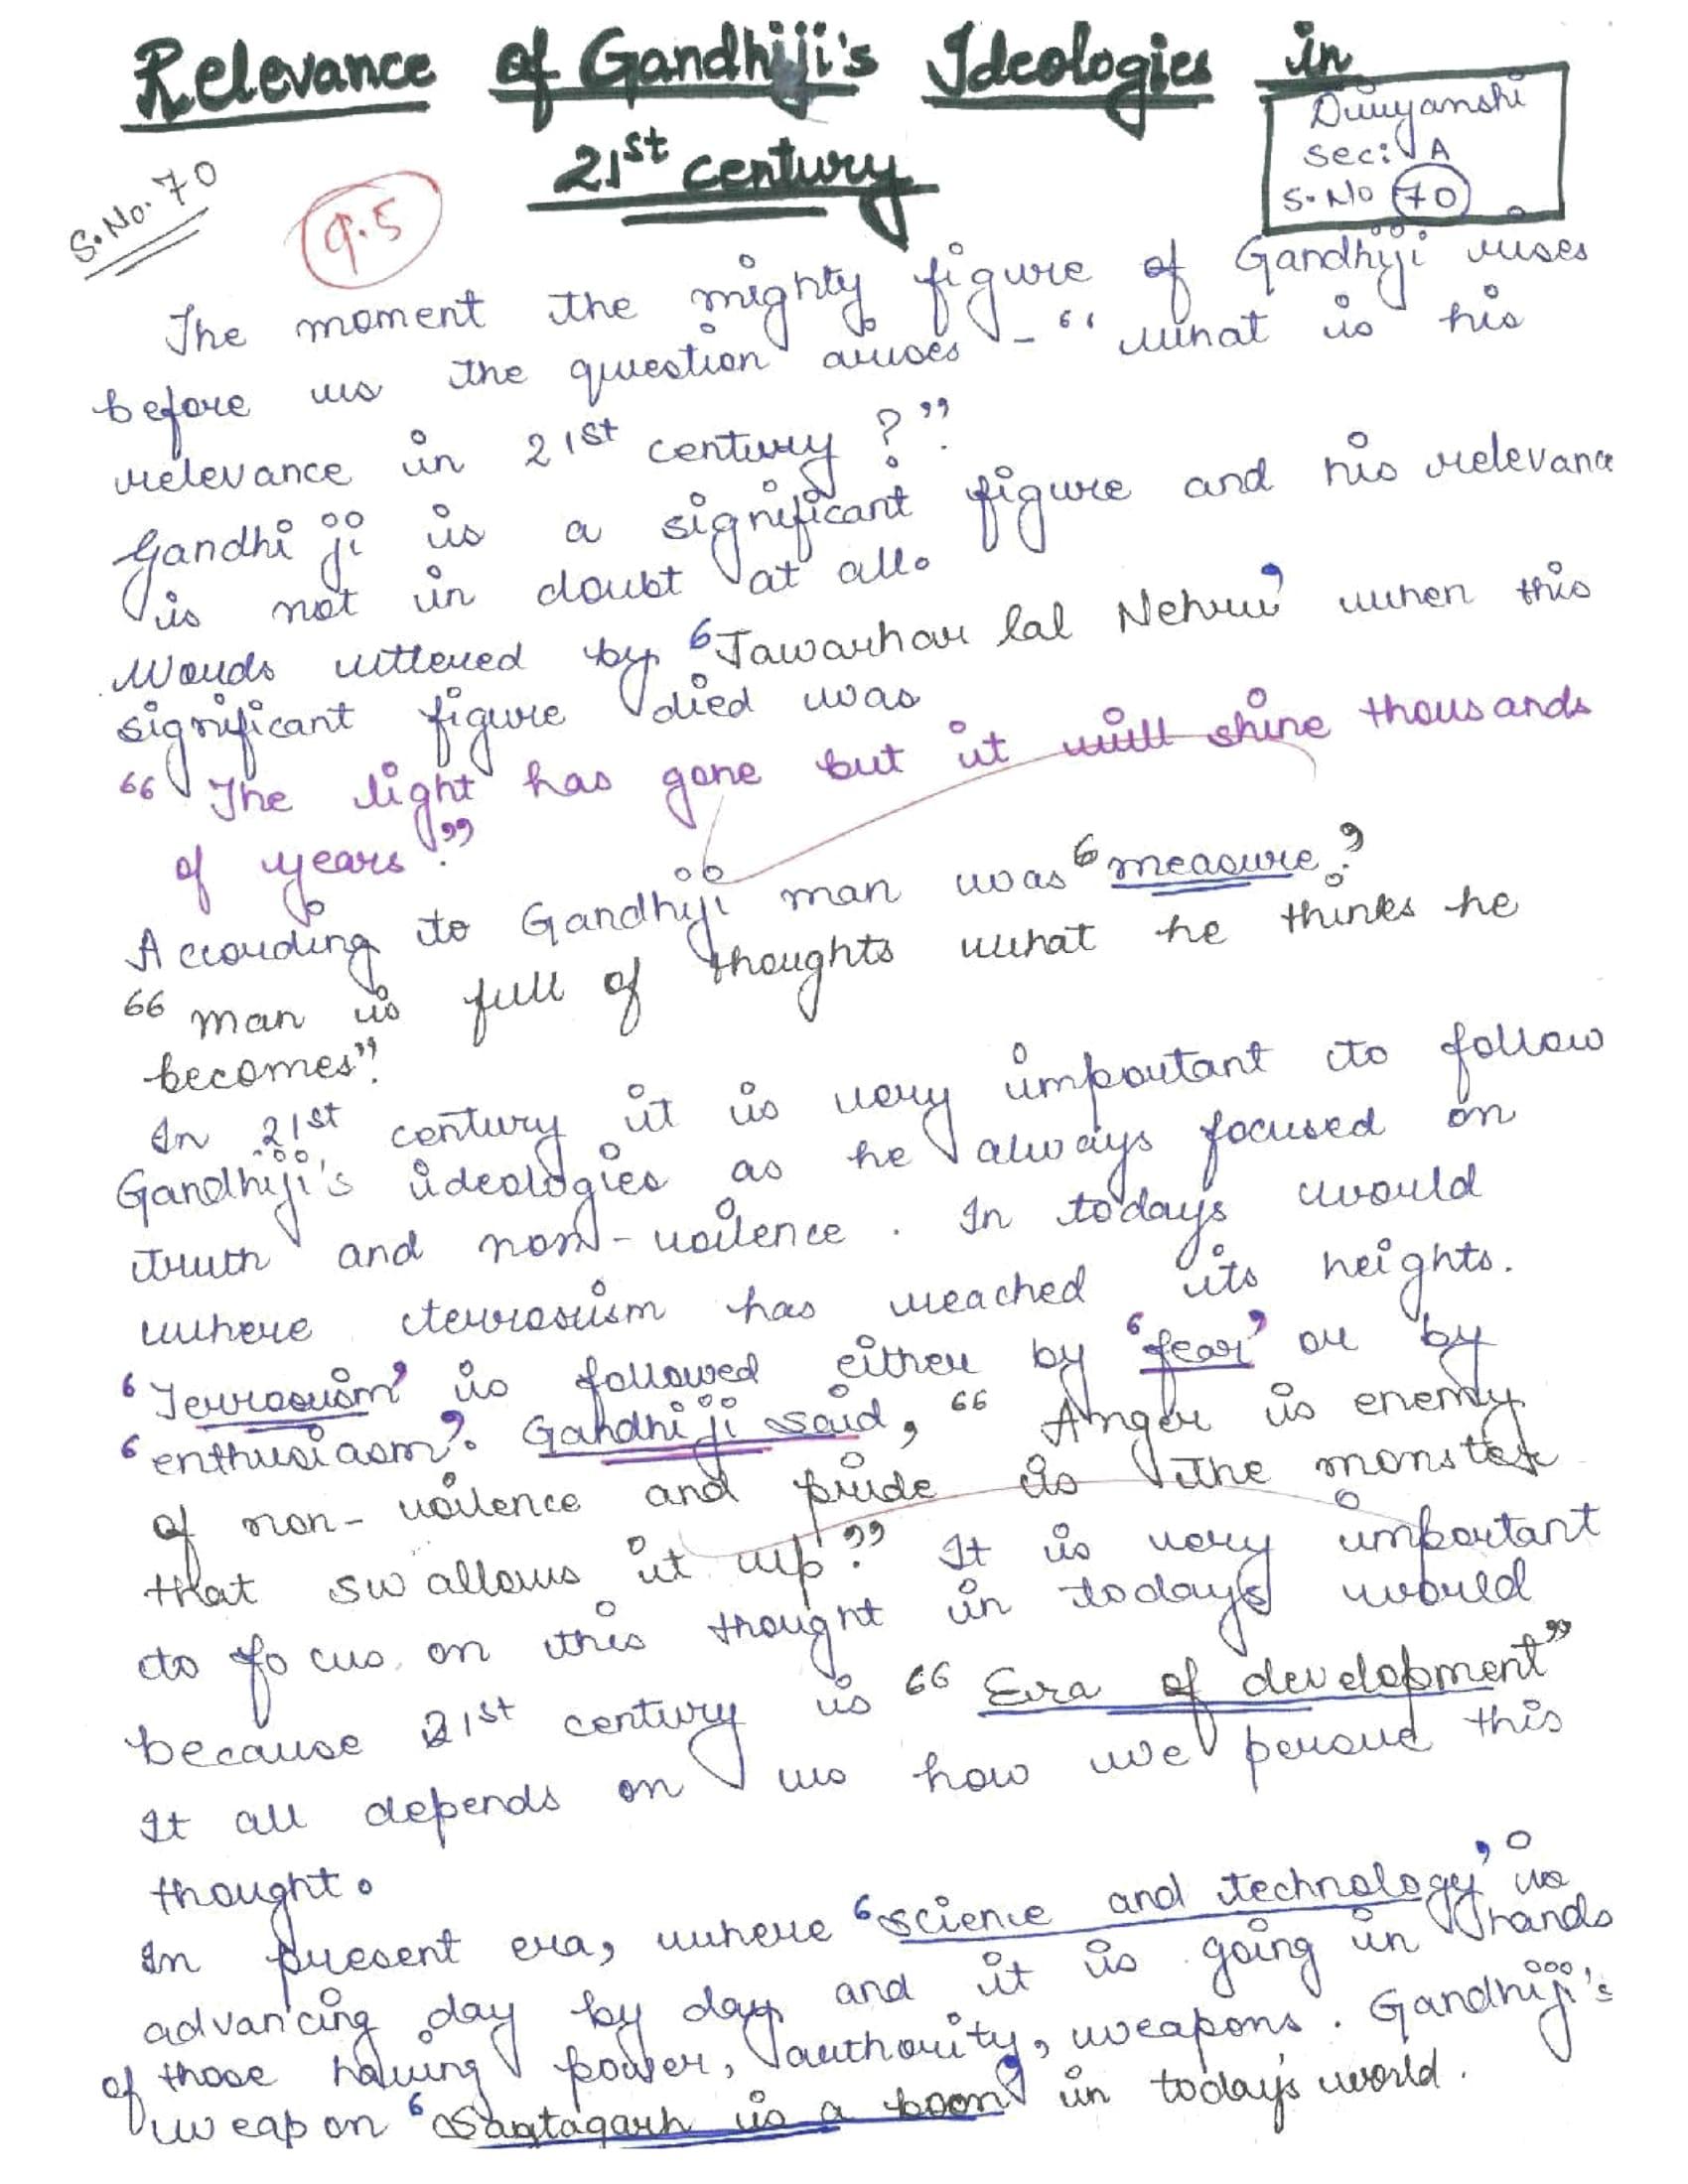 007 Gandhiji Essay Essay1 Sensational Mahatma Gandhi In Gujarati Pdf Free Download Hindi Language Ma Nibandh Full